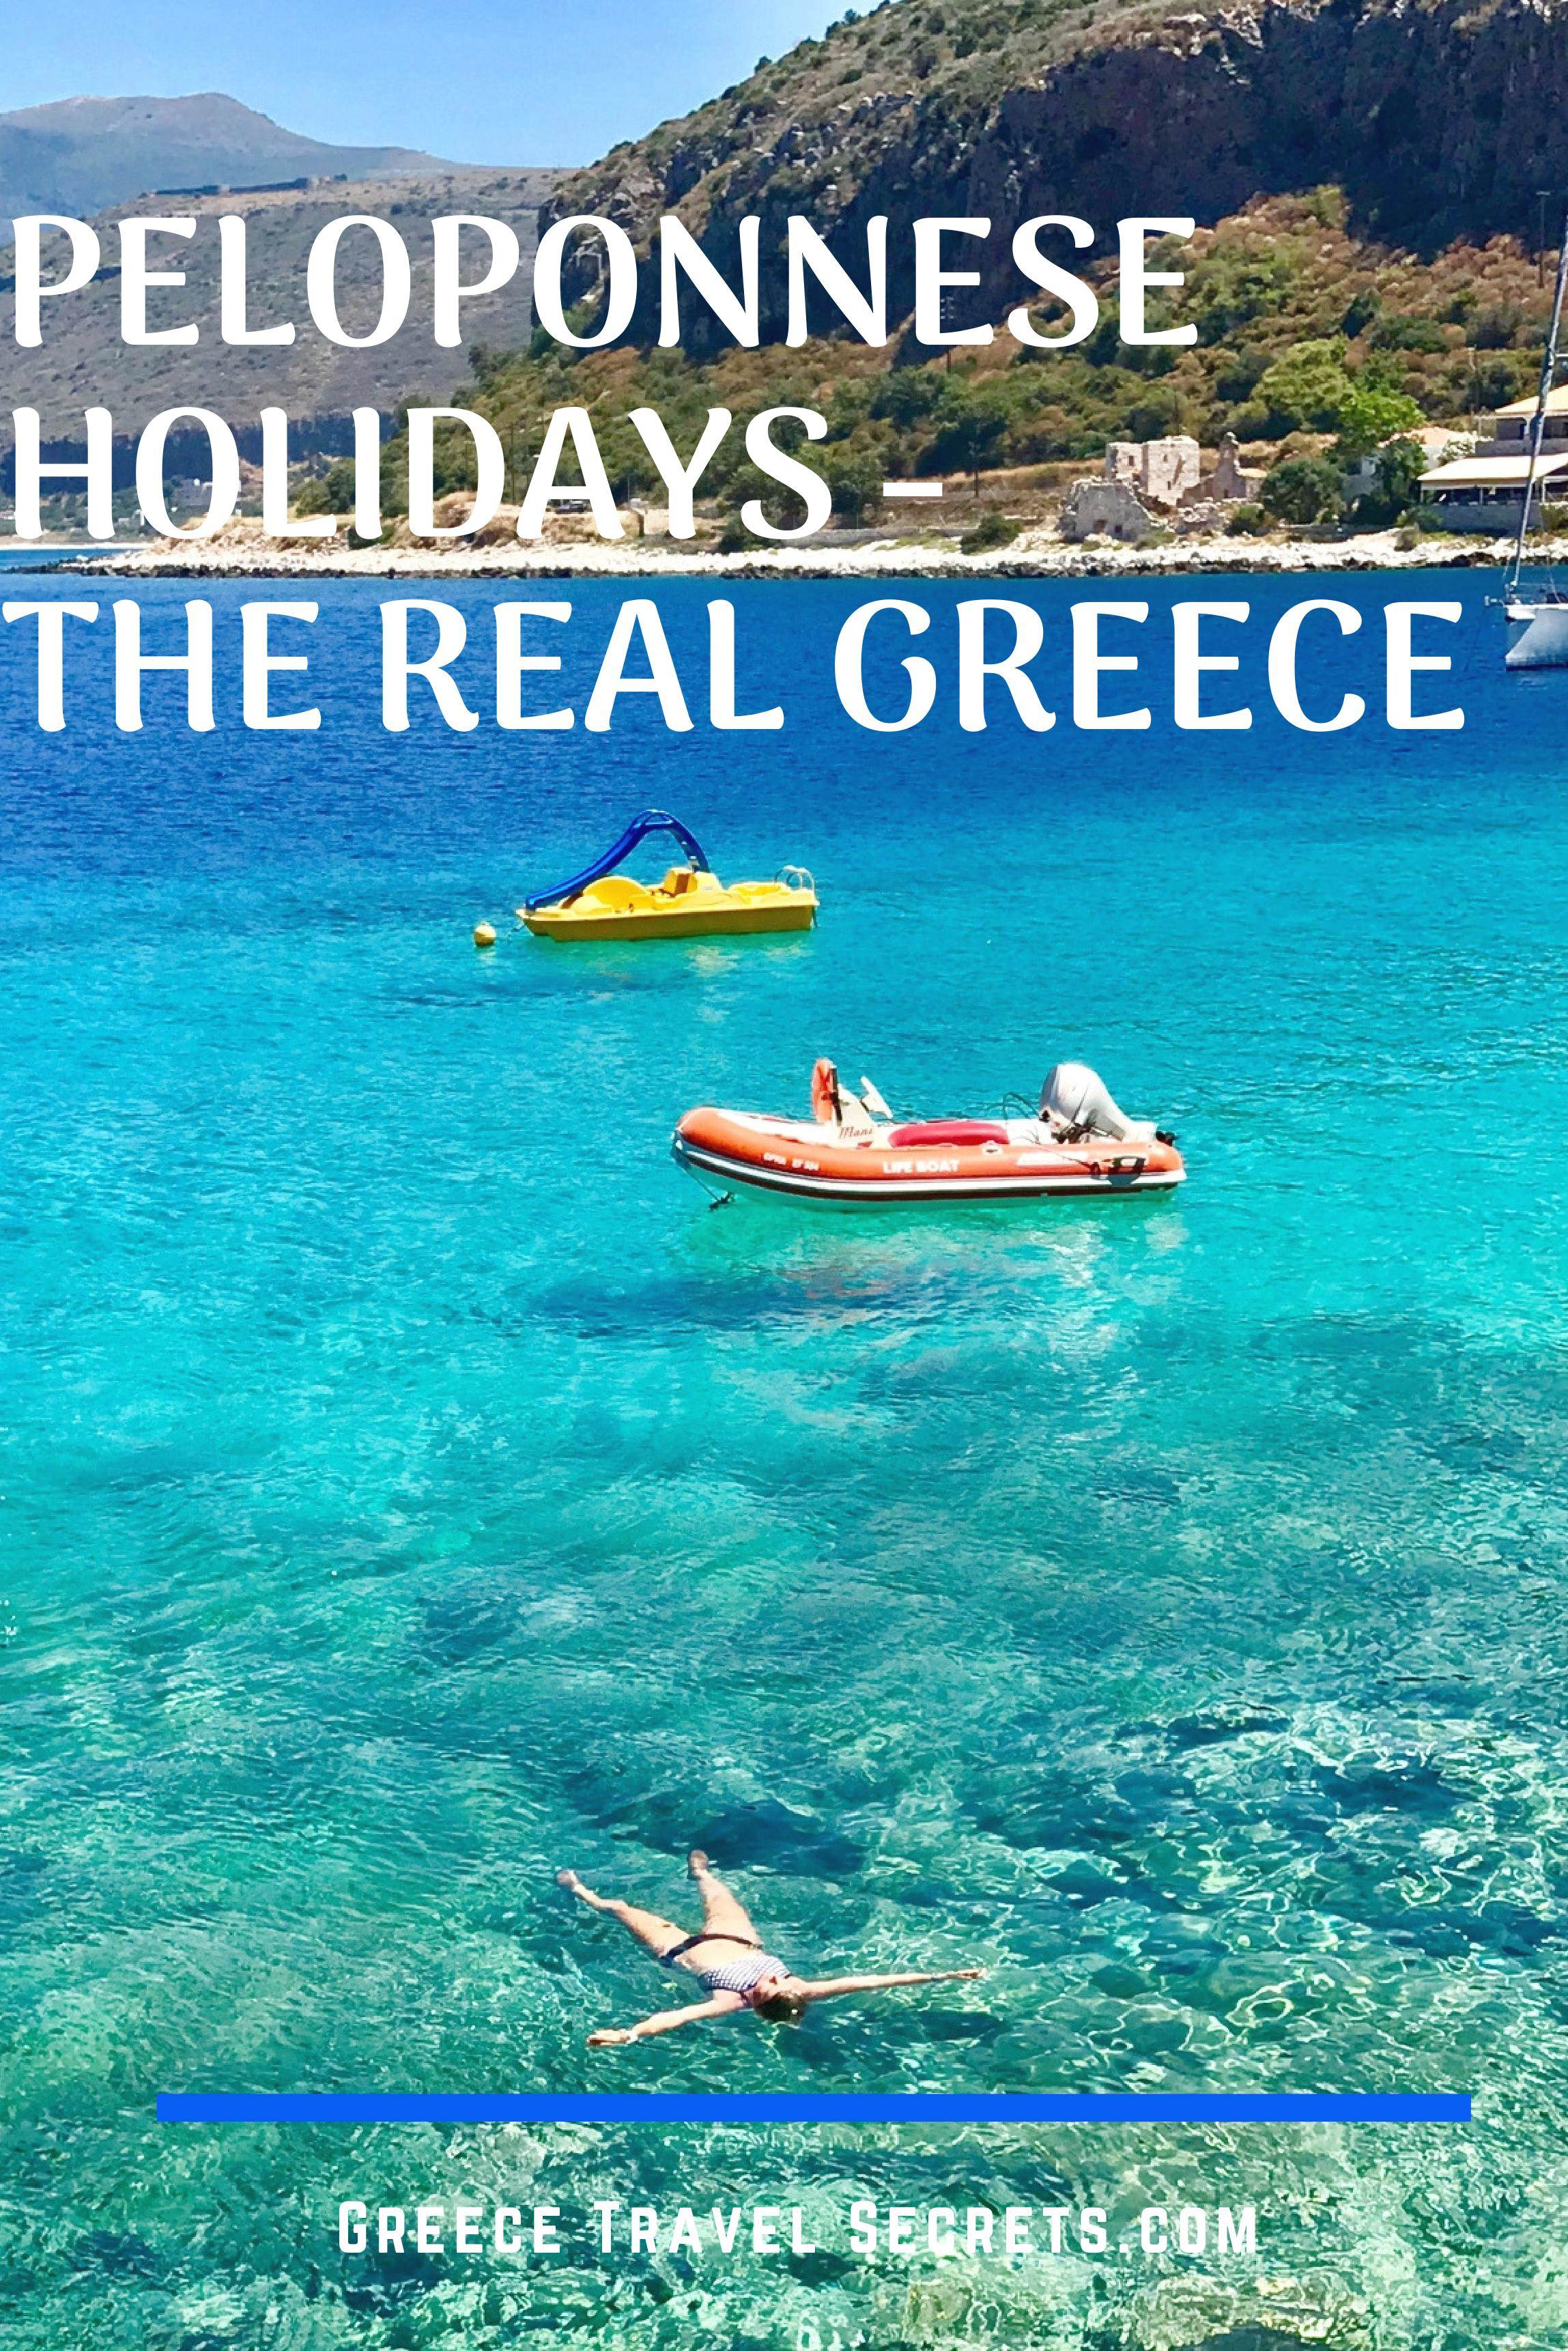 Peloponnese vacation